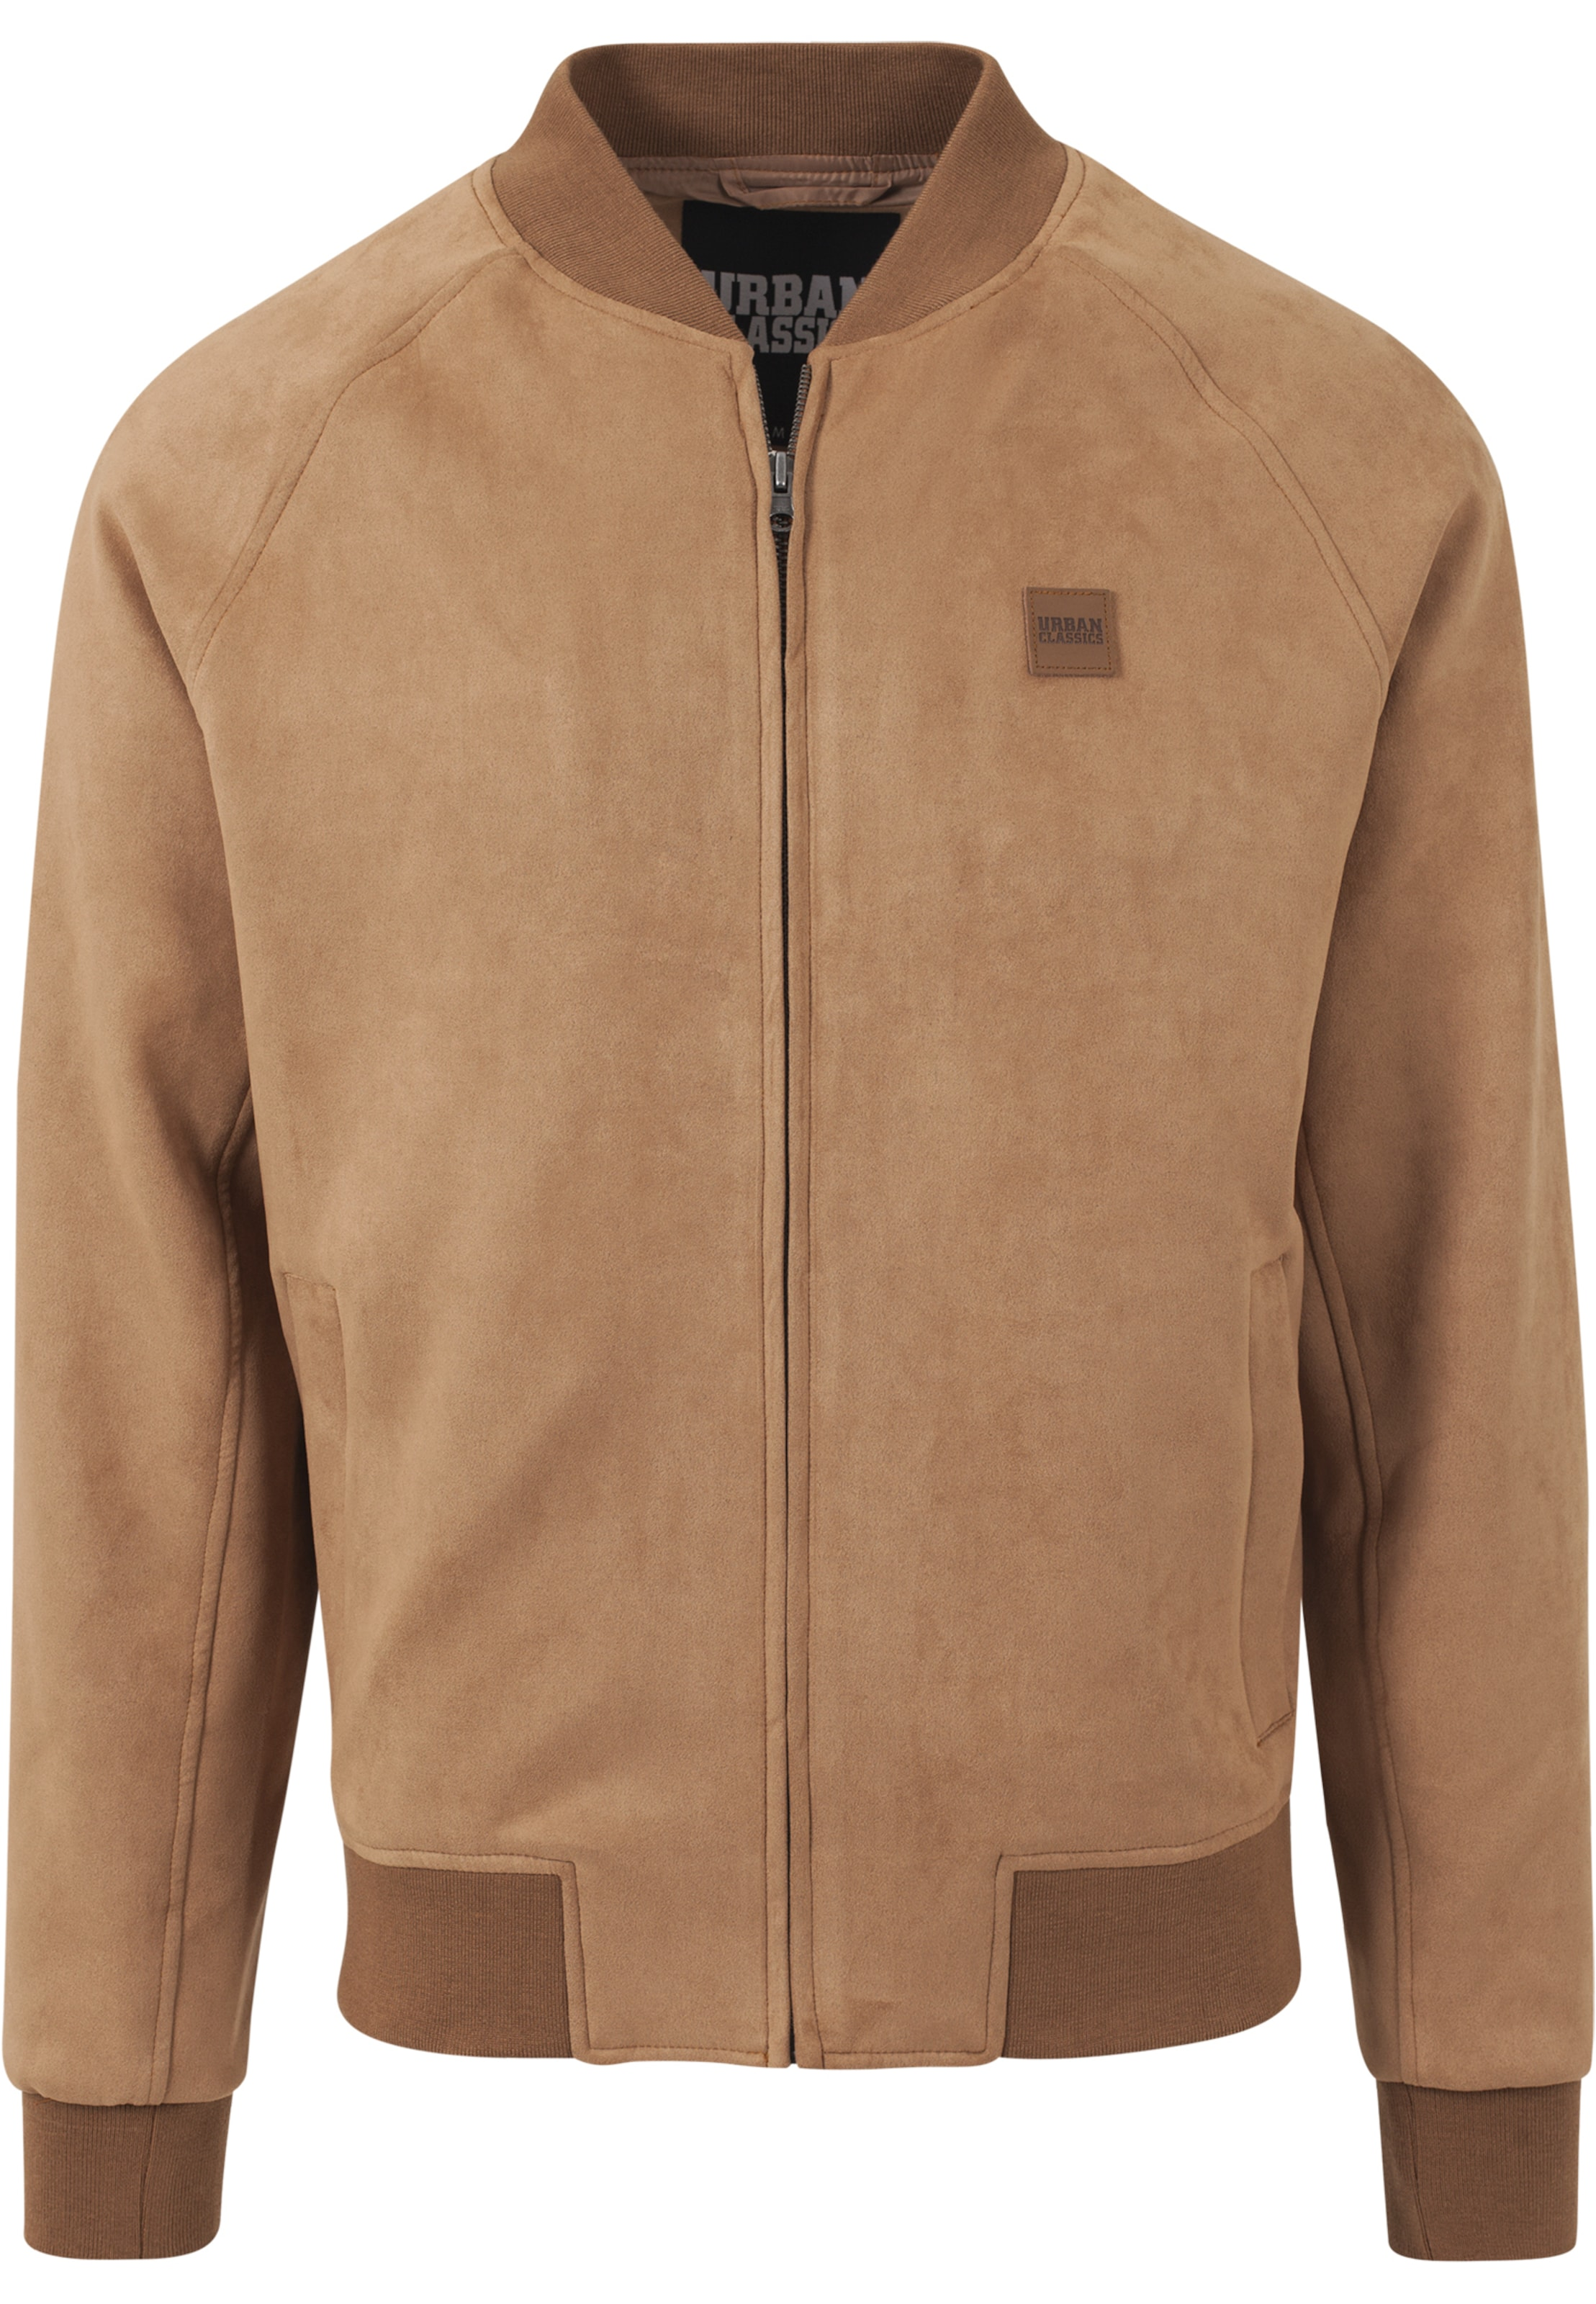 Urban Jacket Classics In Beige In Beige Urban Jacket Classics Urban 4ARL5j